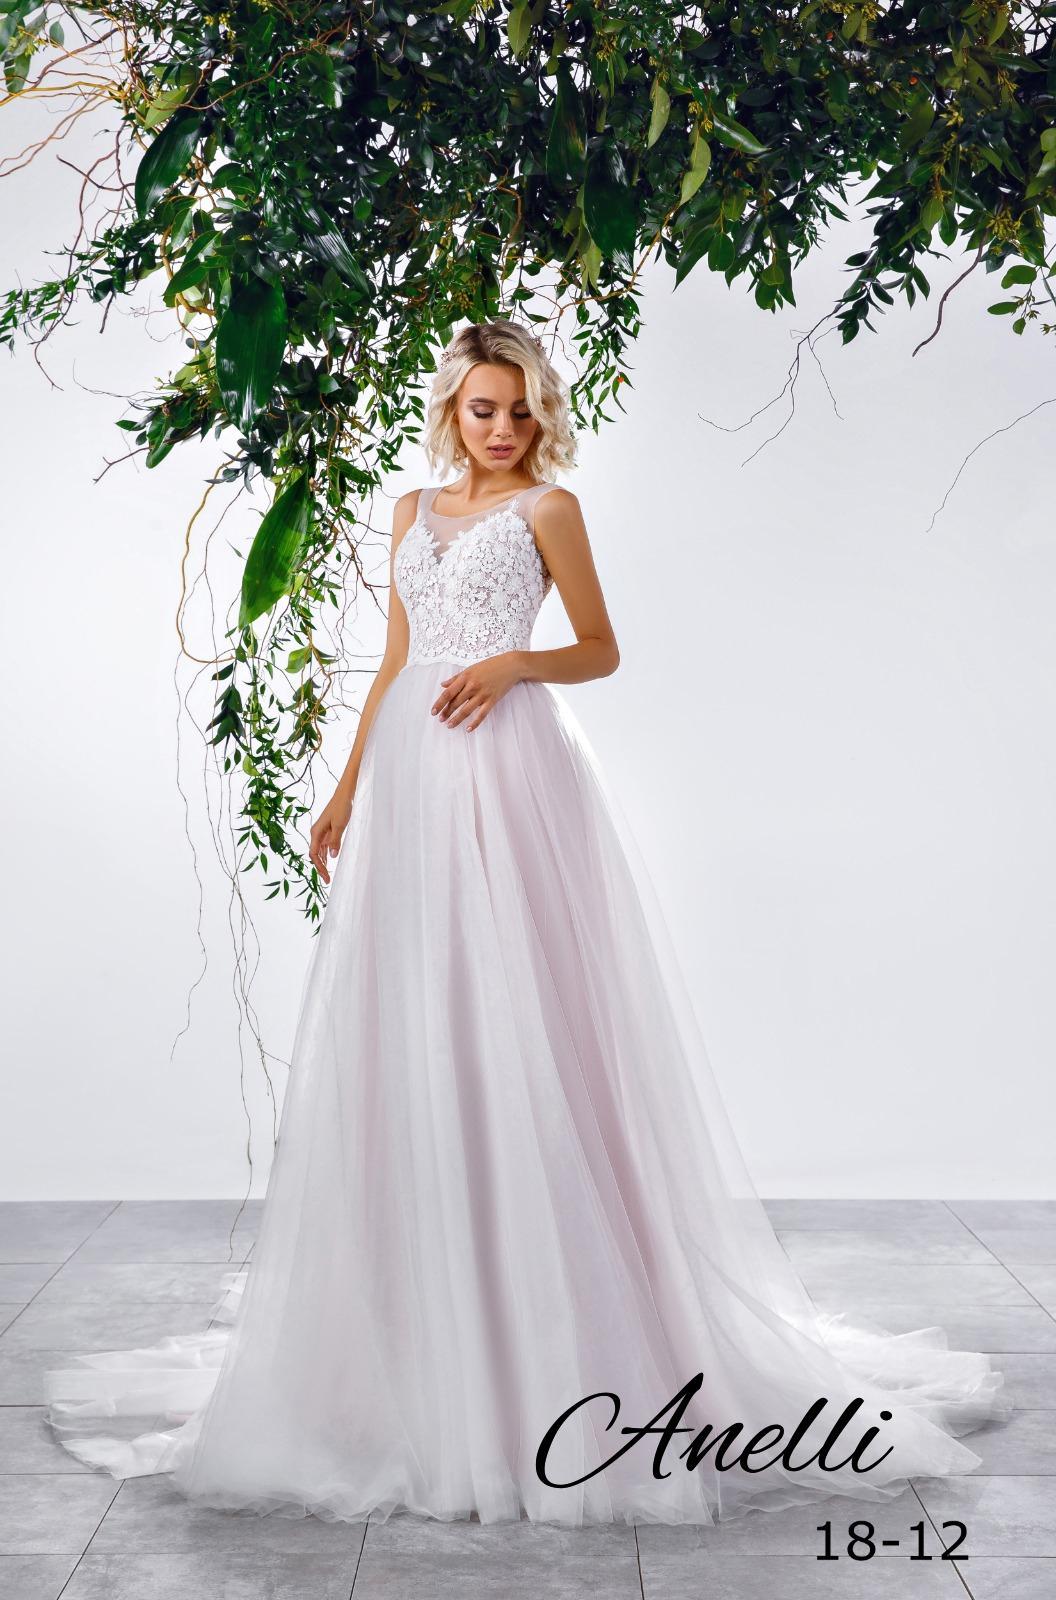 Svadobné šaty - Floral 1812 - Obrázok č. 1